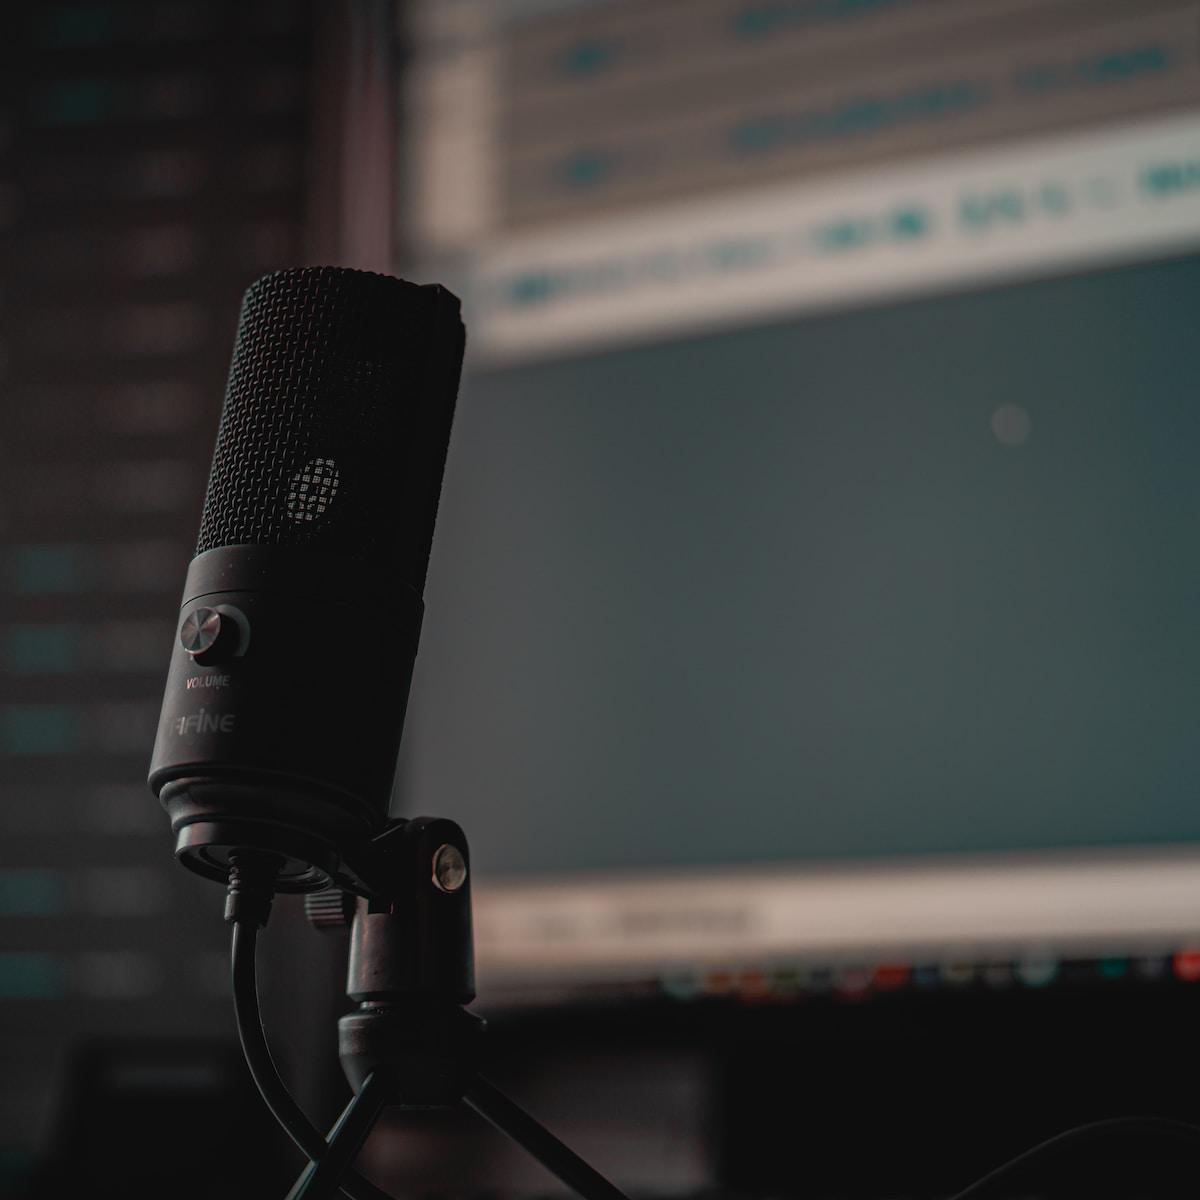 black microphone on black microphone stand